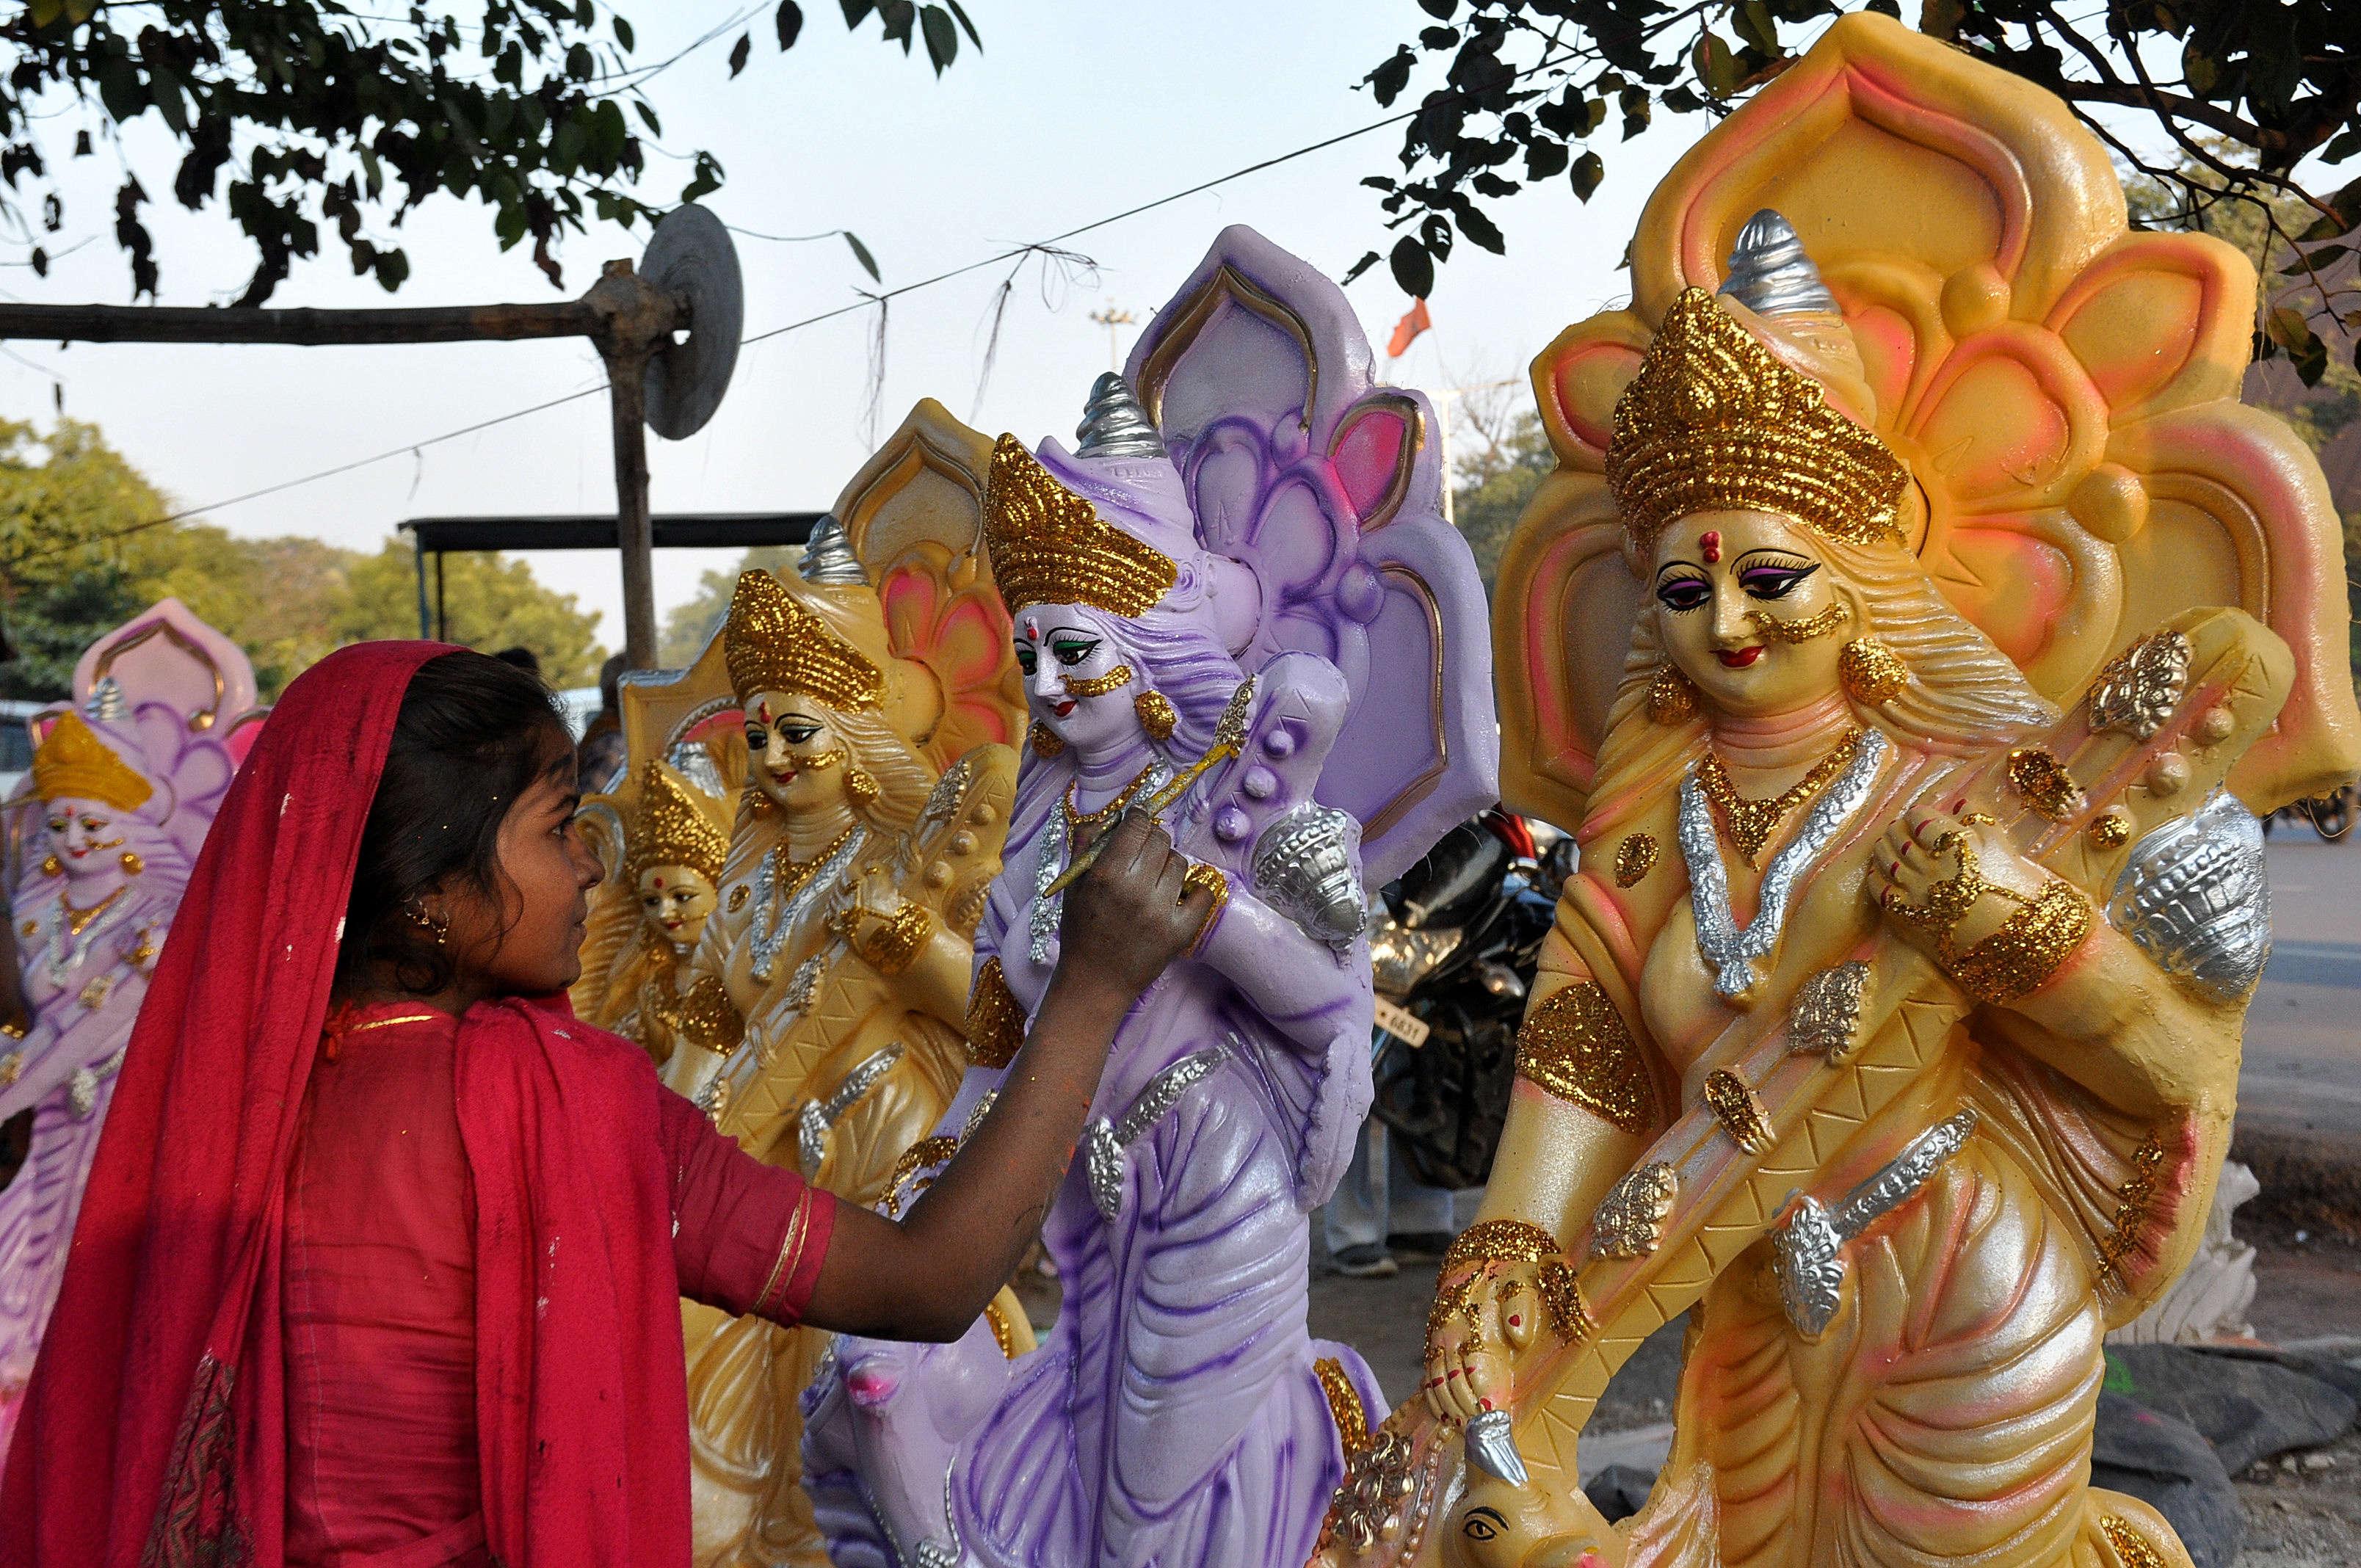 Saraswati Puja 2020: Date, Time, Significance, Puja Vidhi & Mantra